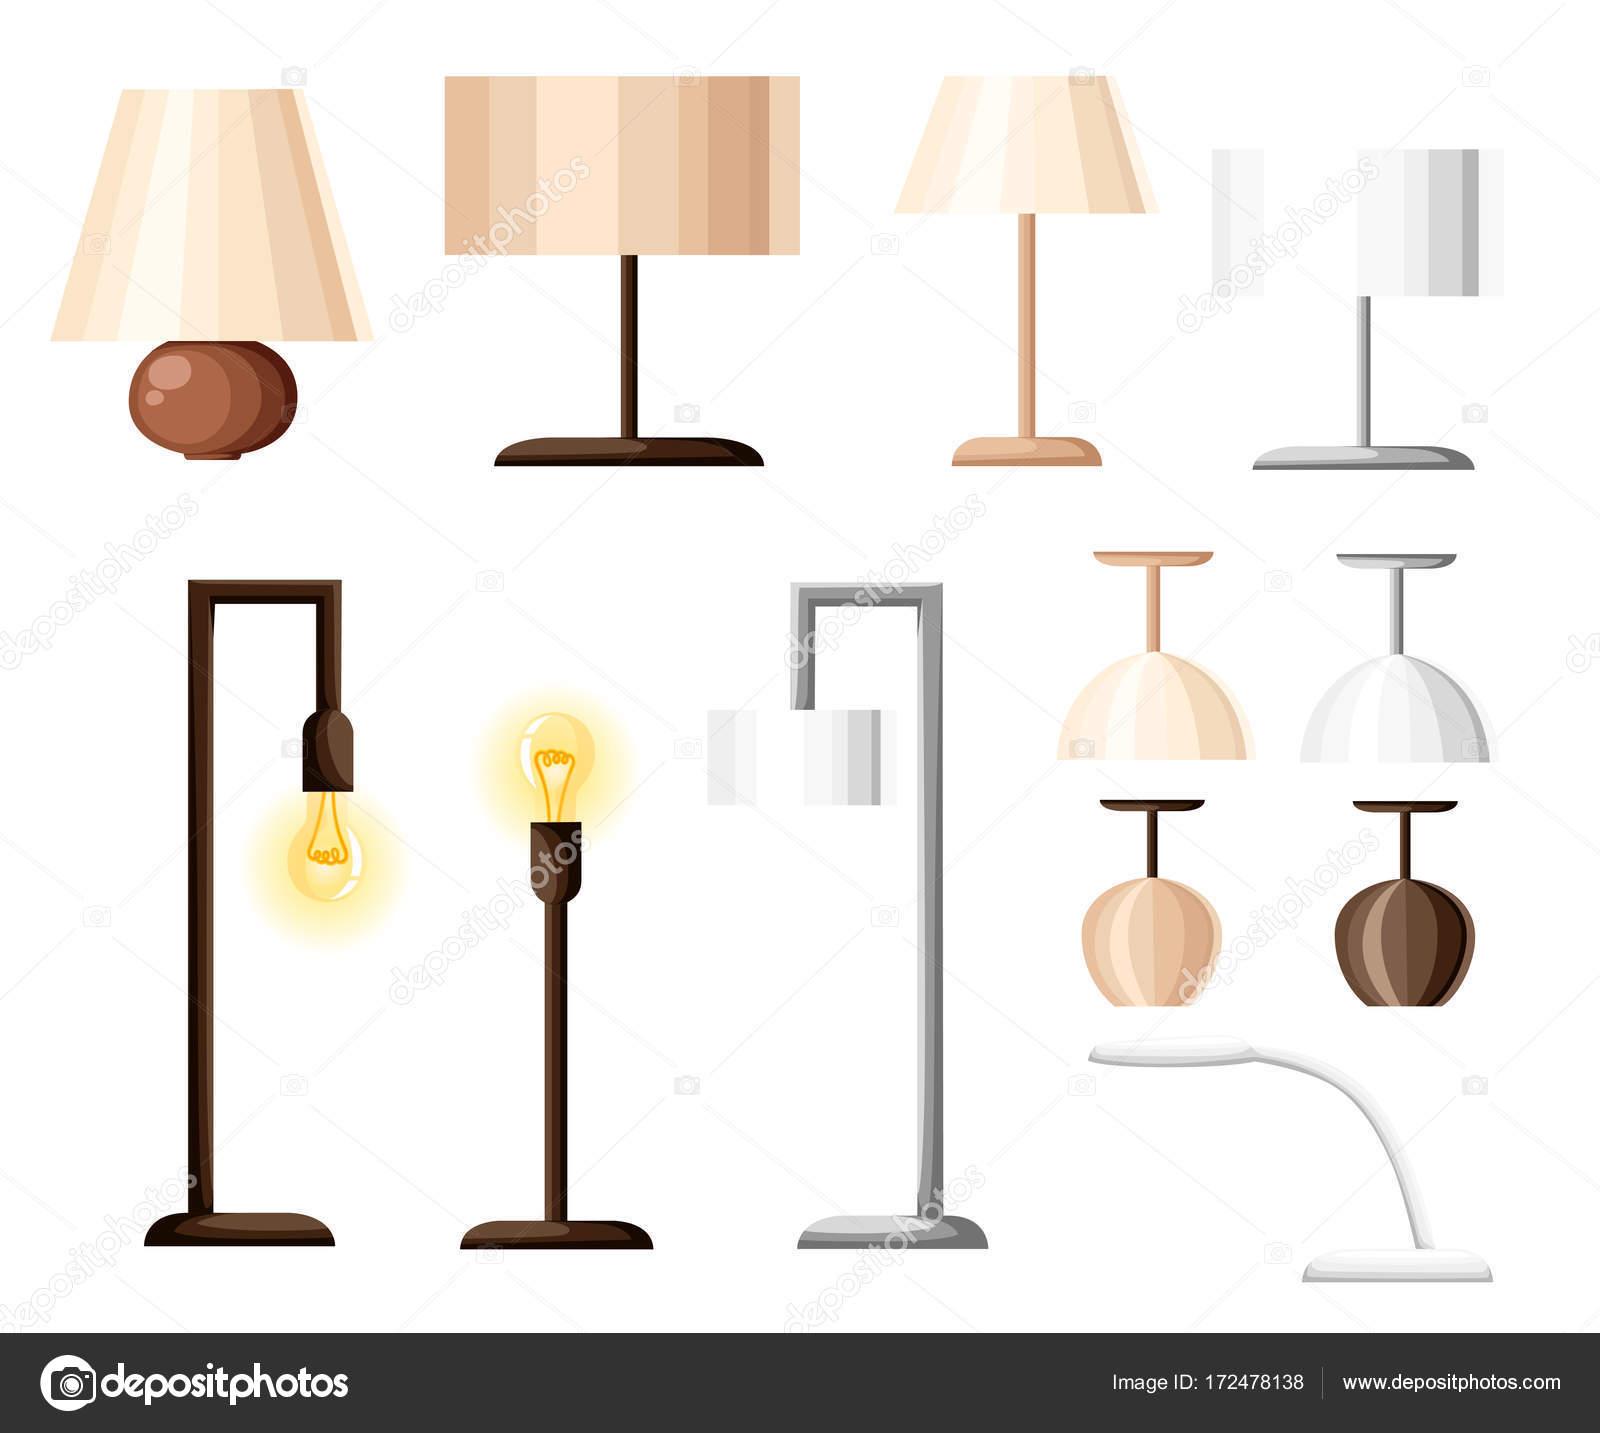 vector set different types indoor lighting pendant ceiling light spotlight stock vector. Black Bedroom Furniture Sets. Home Design Ideas